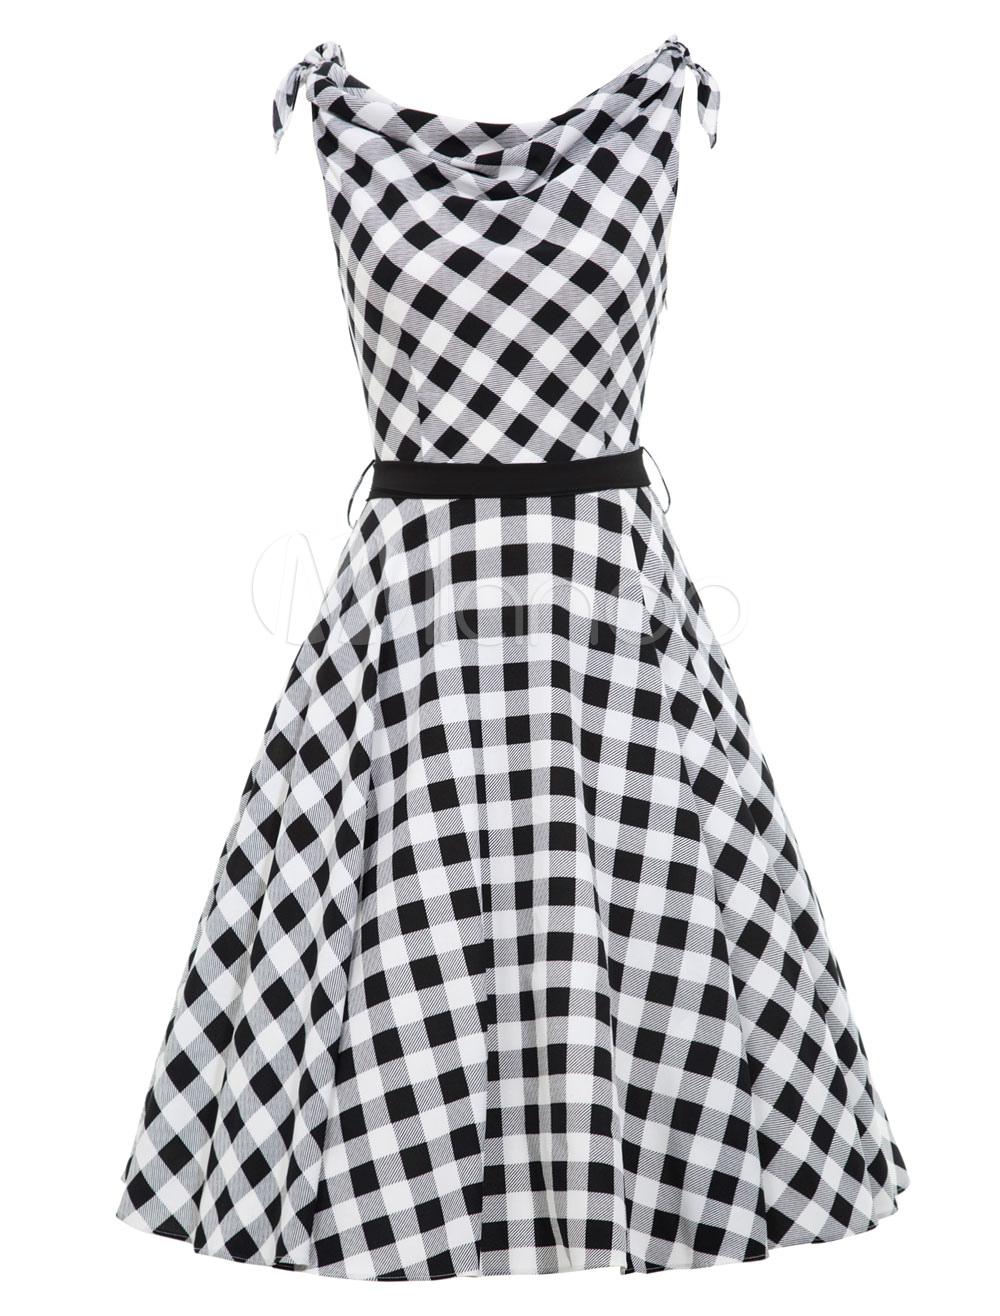 Buy Women Vintage Dress Black Plaid Sleeveless Shoulder Tie Summer A Line Dresses for $28.49 in Milanoo store